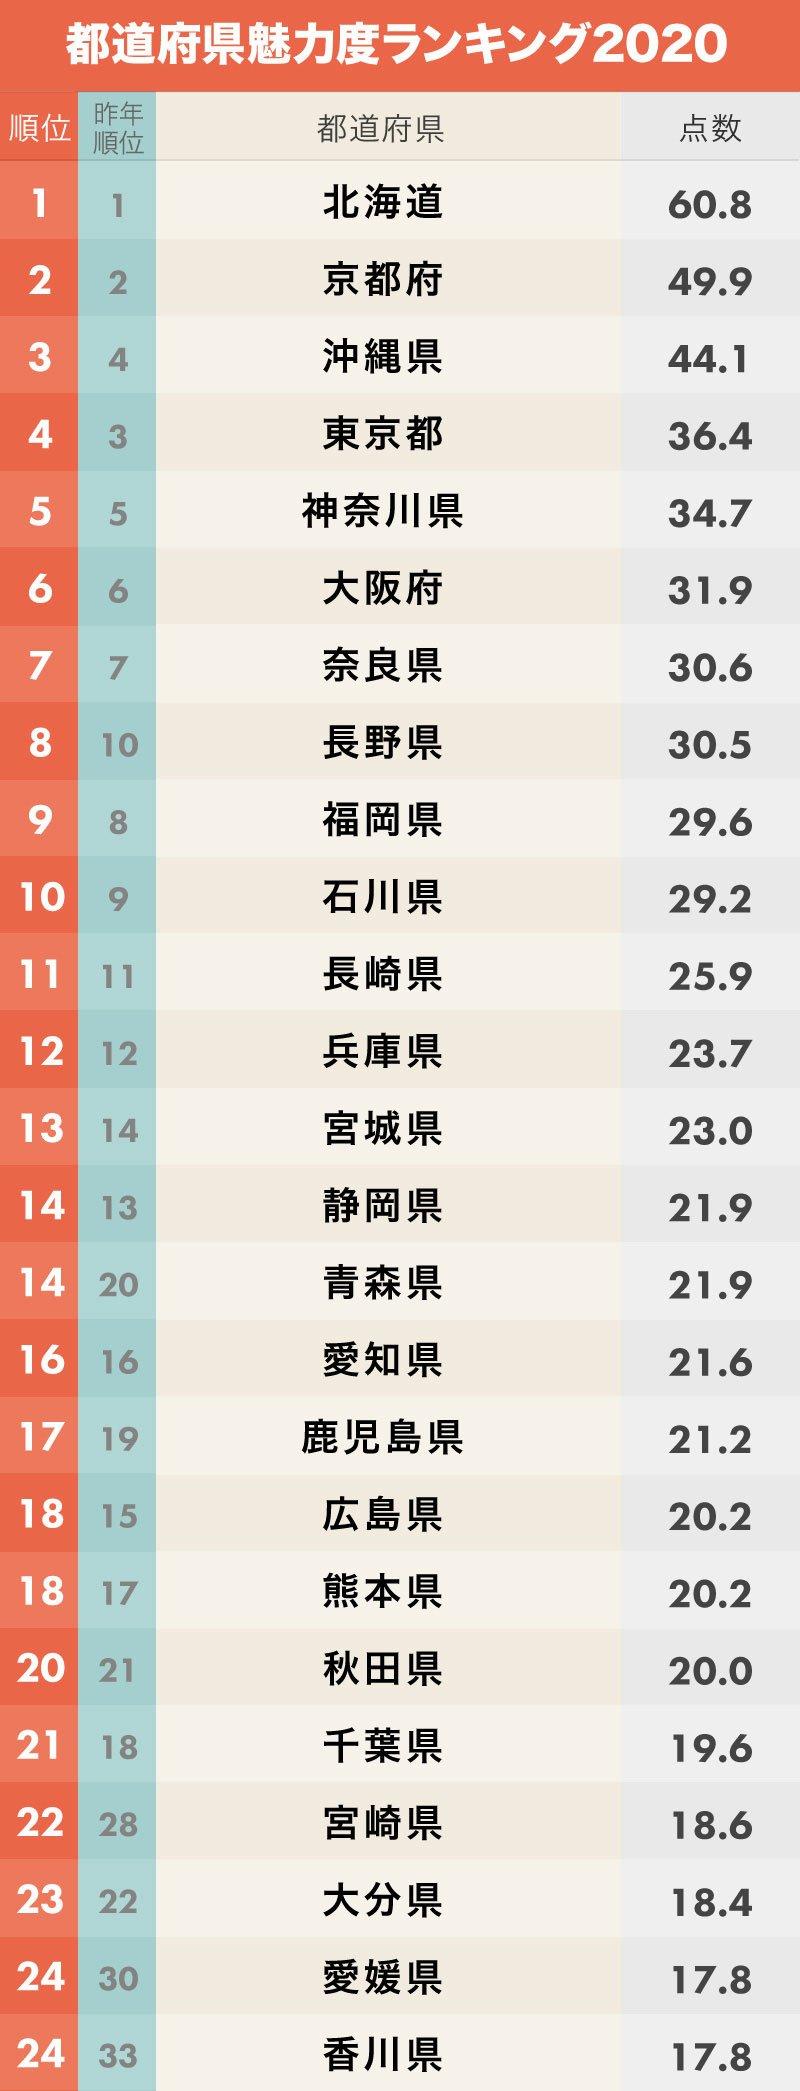 都道府県魅力度ランキング2020【47都道府県・完全版】 | 日本全国ご ...